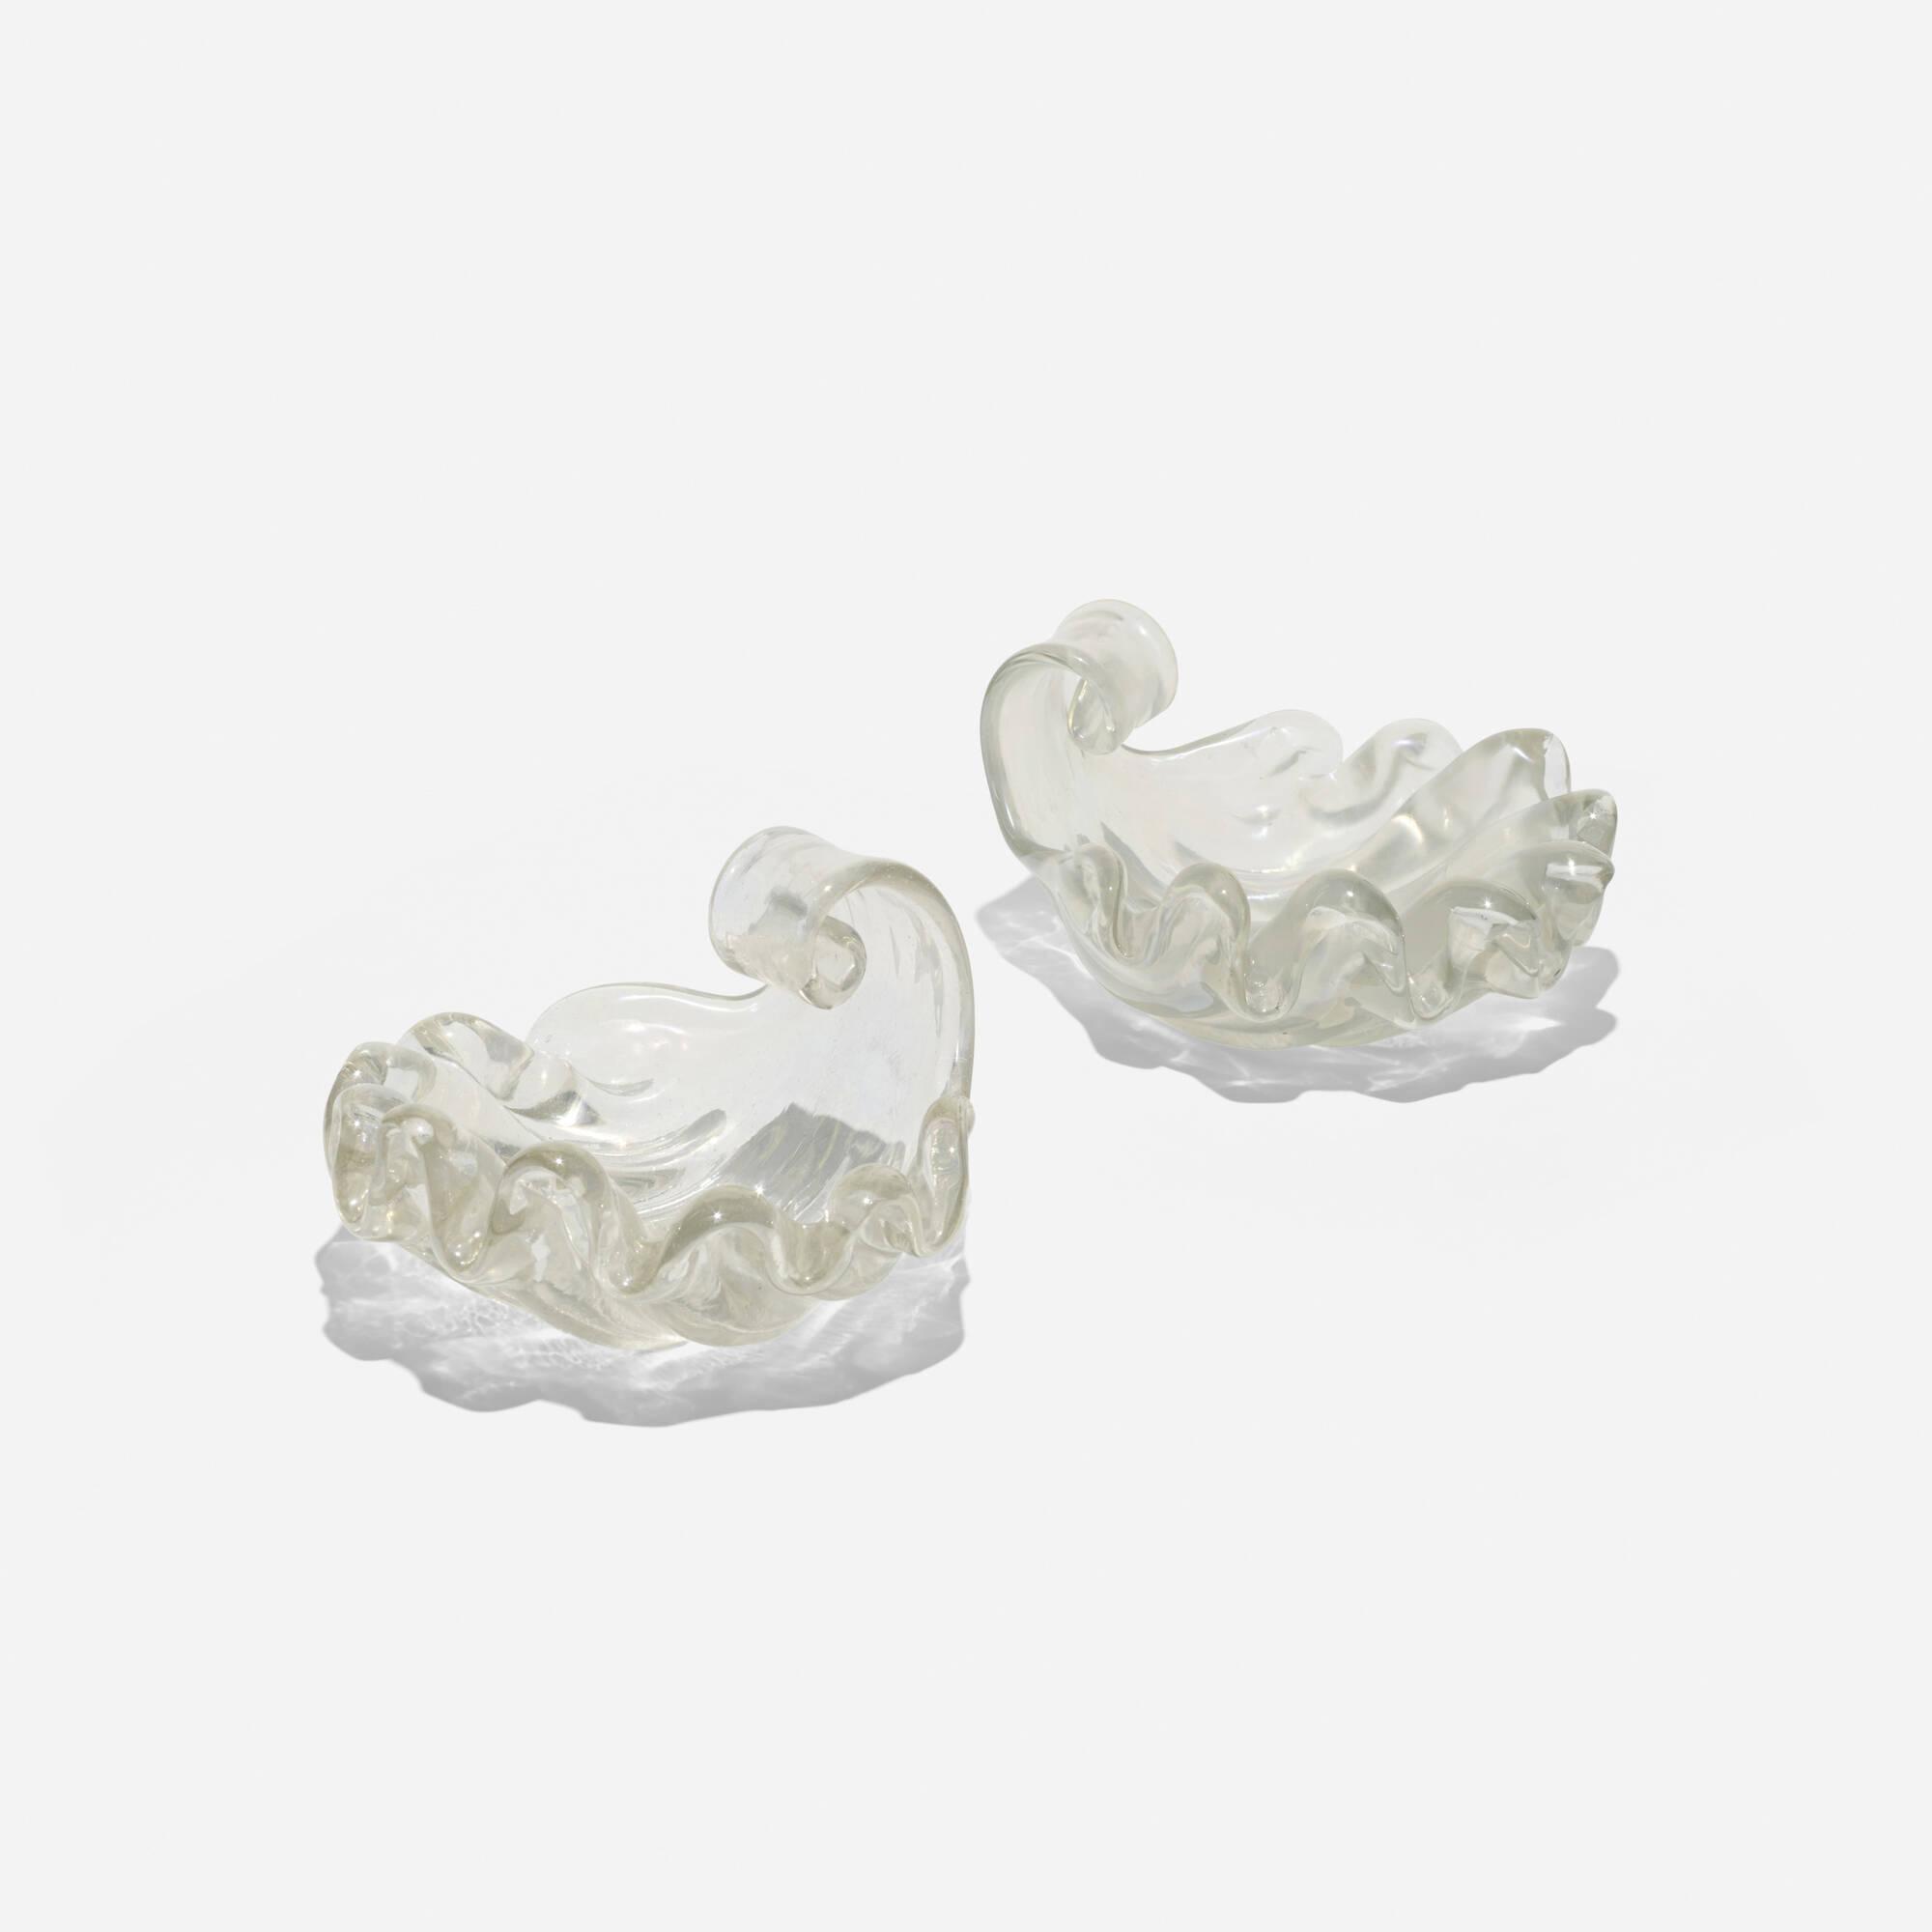 147: Ercole Barovier / bowls, pair (1 of 1)